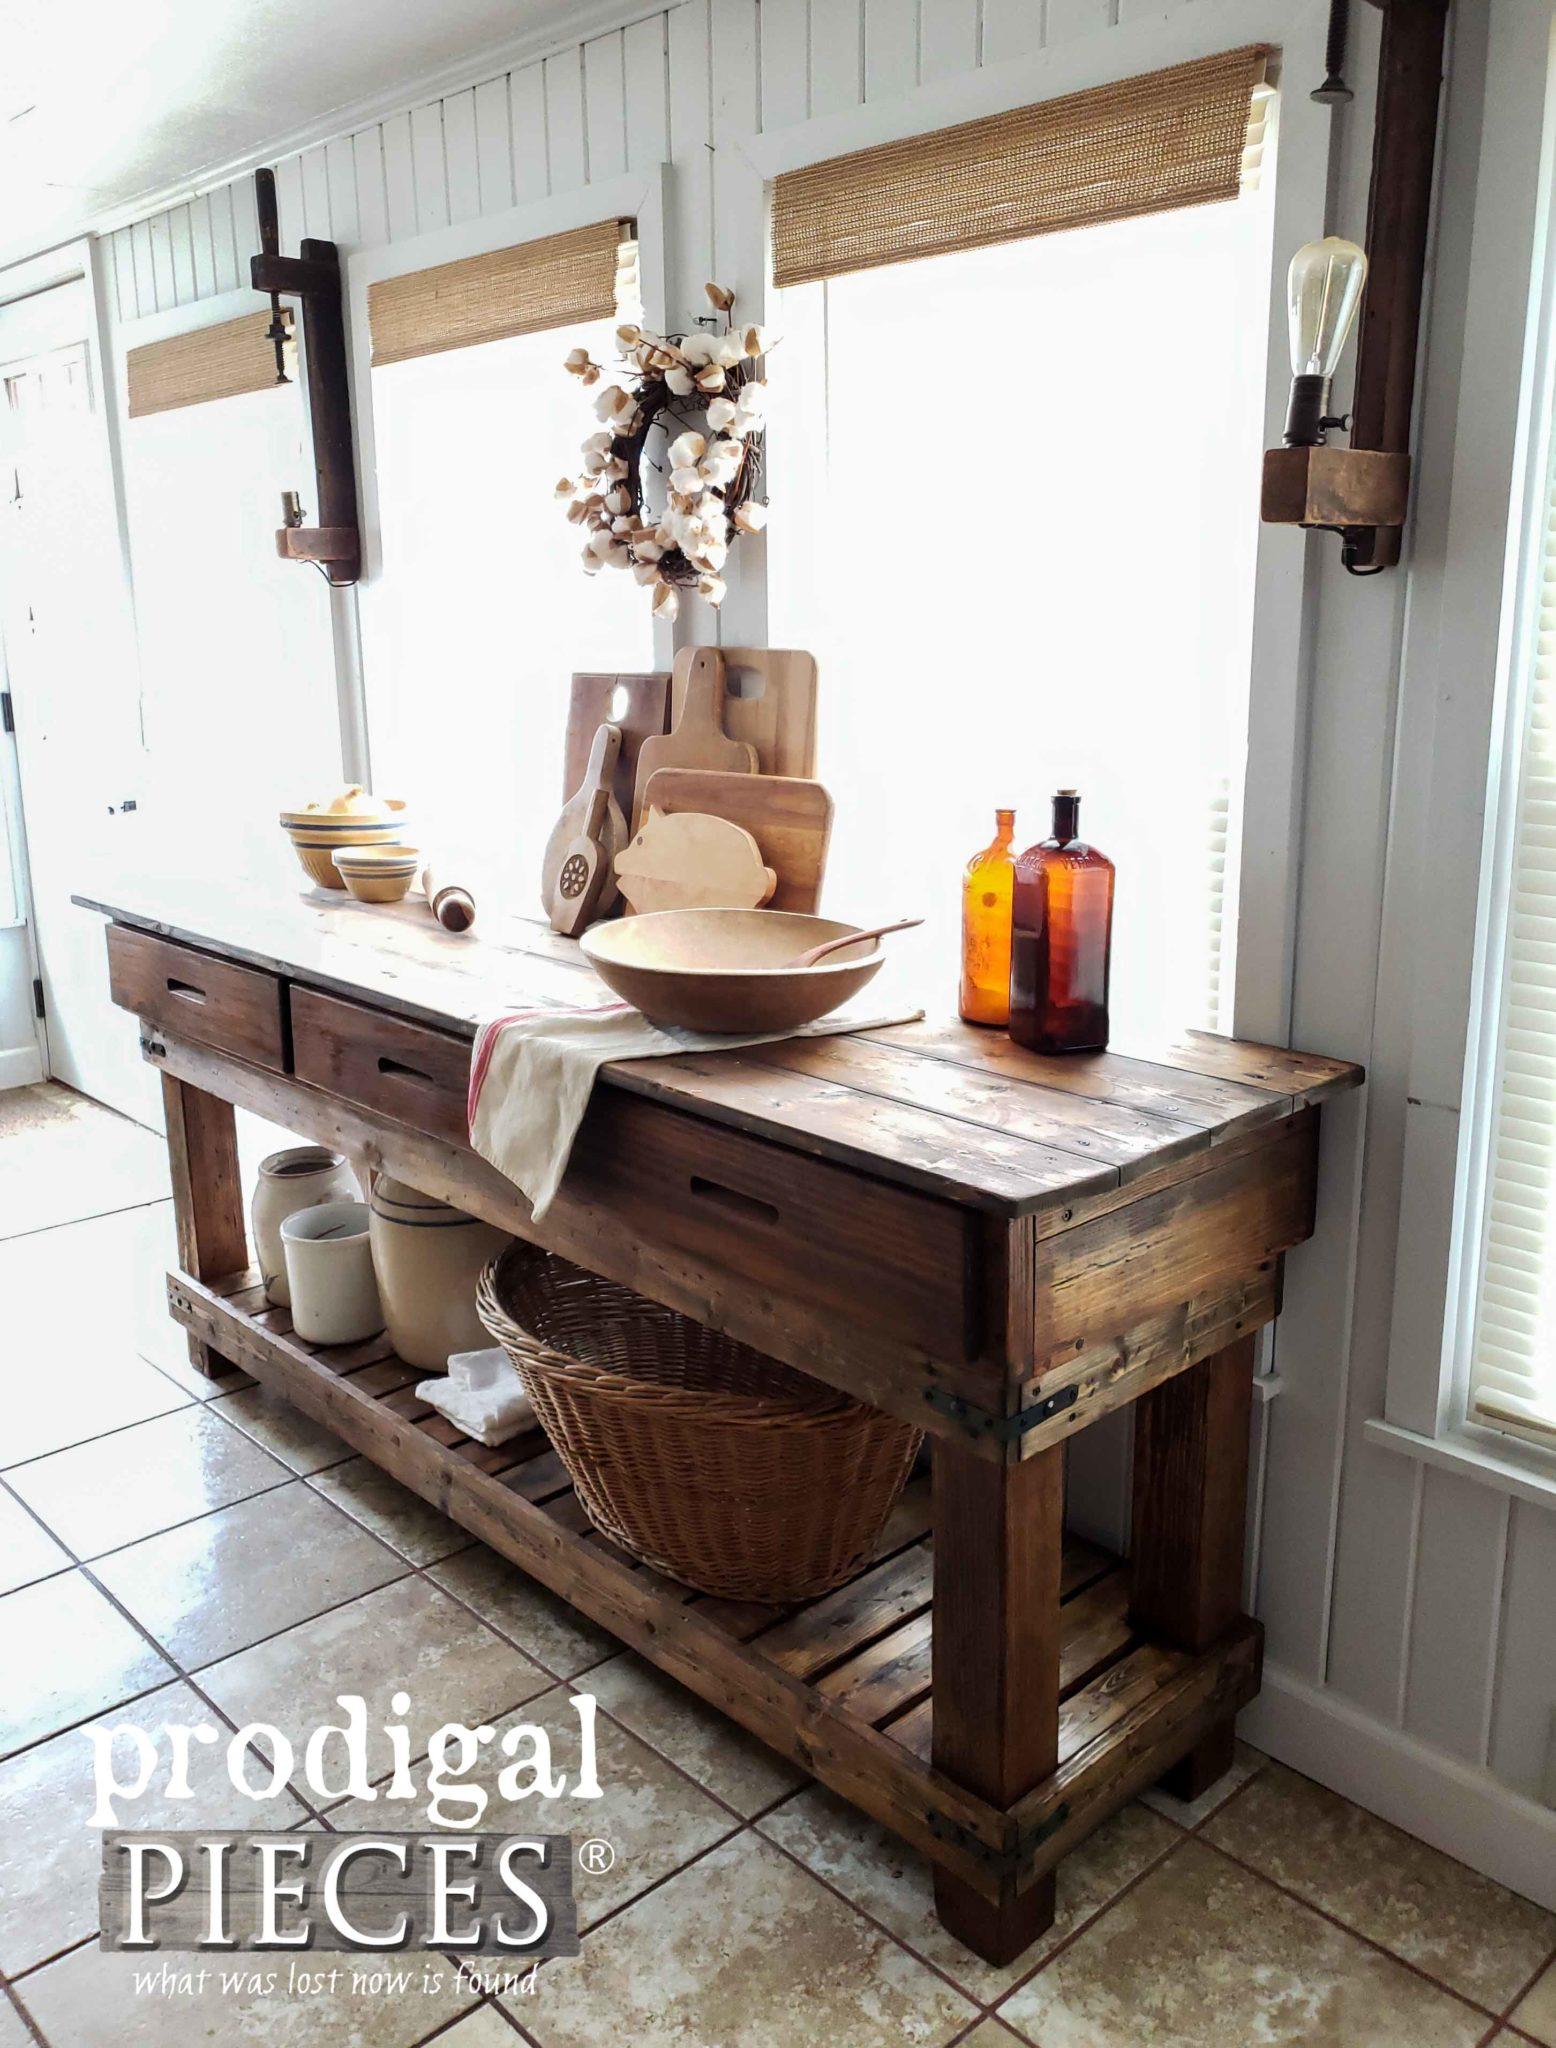 Rustic DIY Farmhouse Workbench Console by Larissa of Prodigal Pieces | prodigalpieces.com